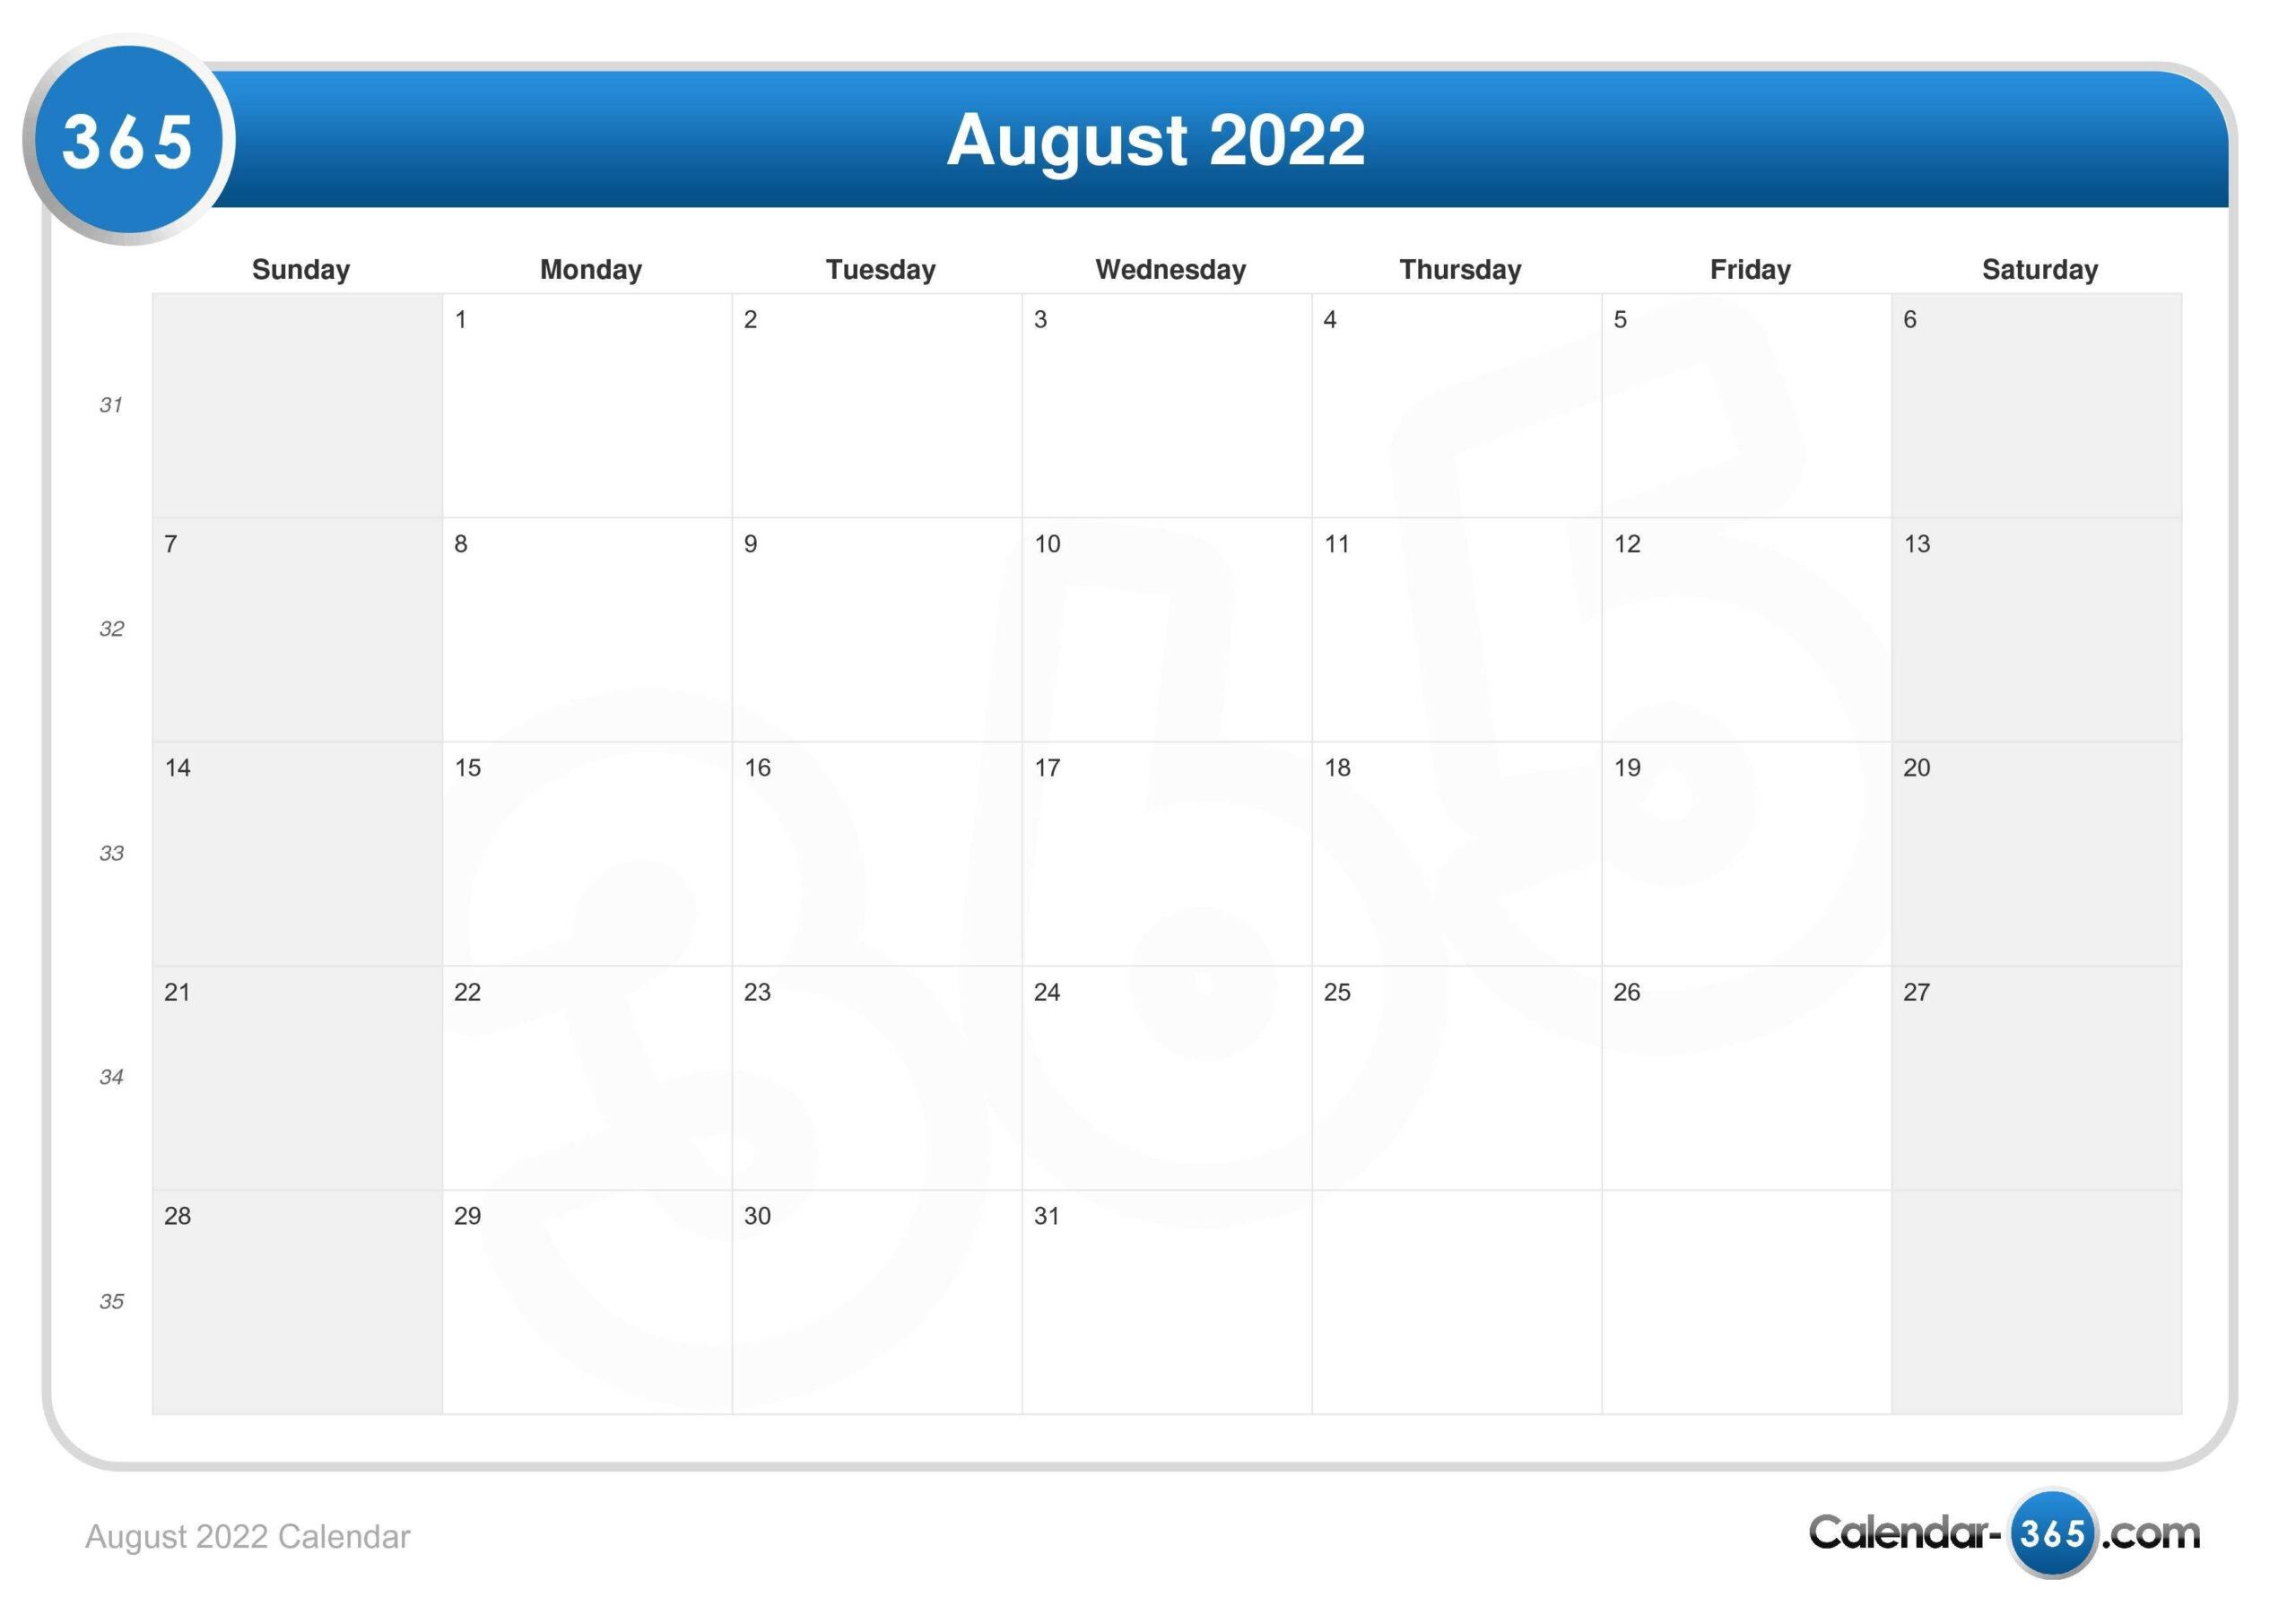 August 2022 Calendar throughout Printable Monthly Calendar August 2022 Photo